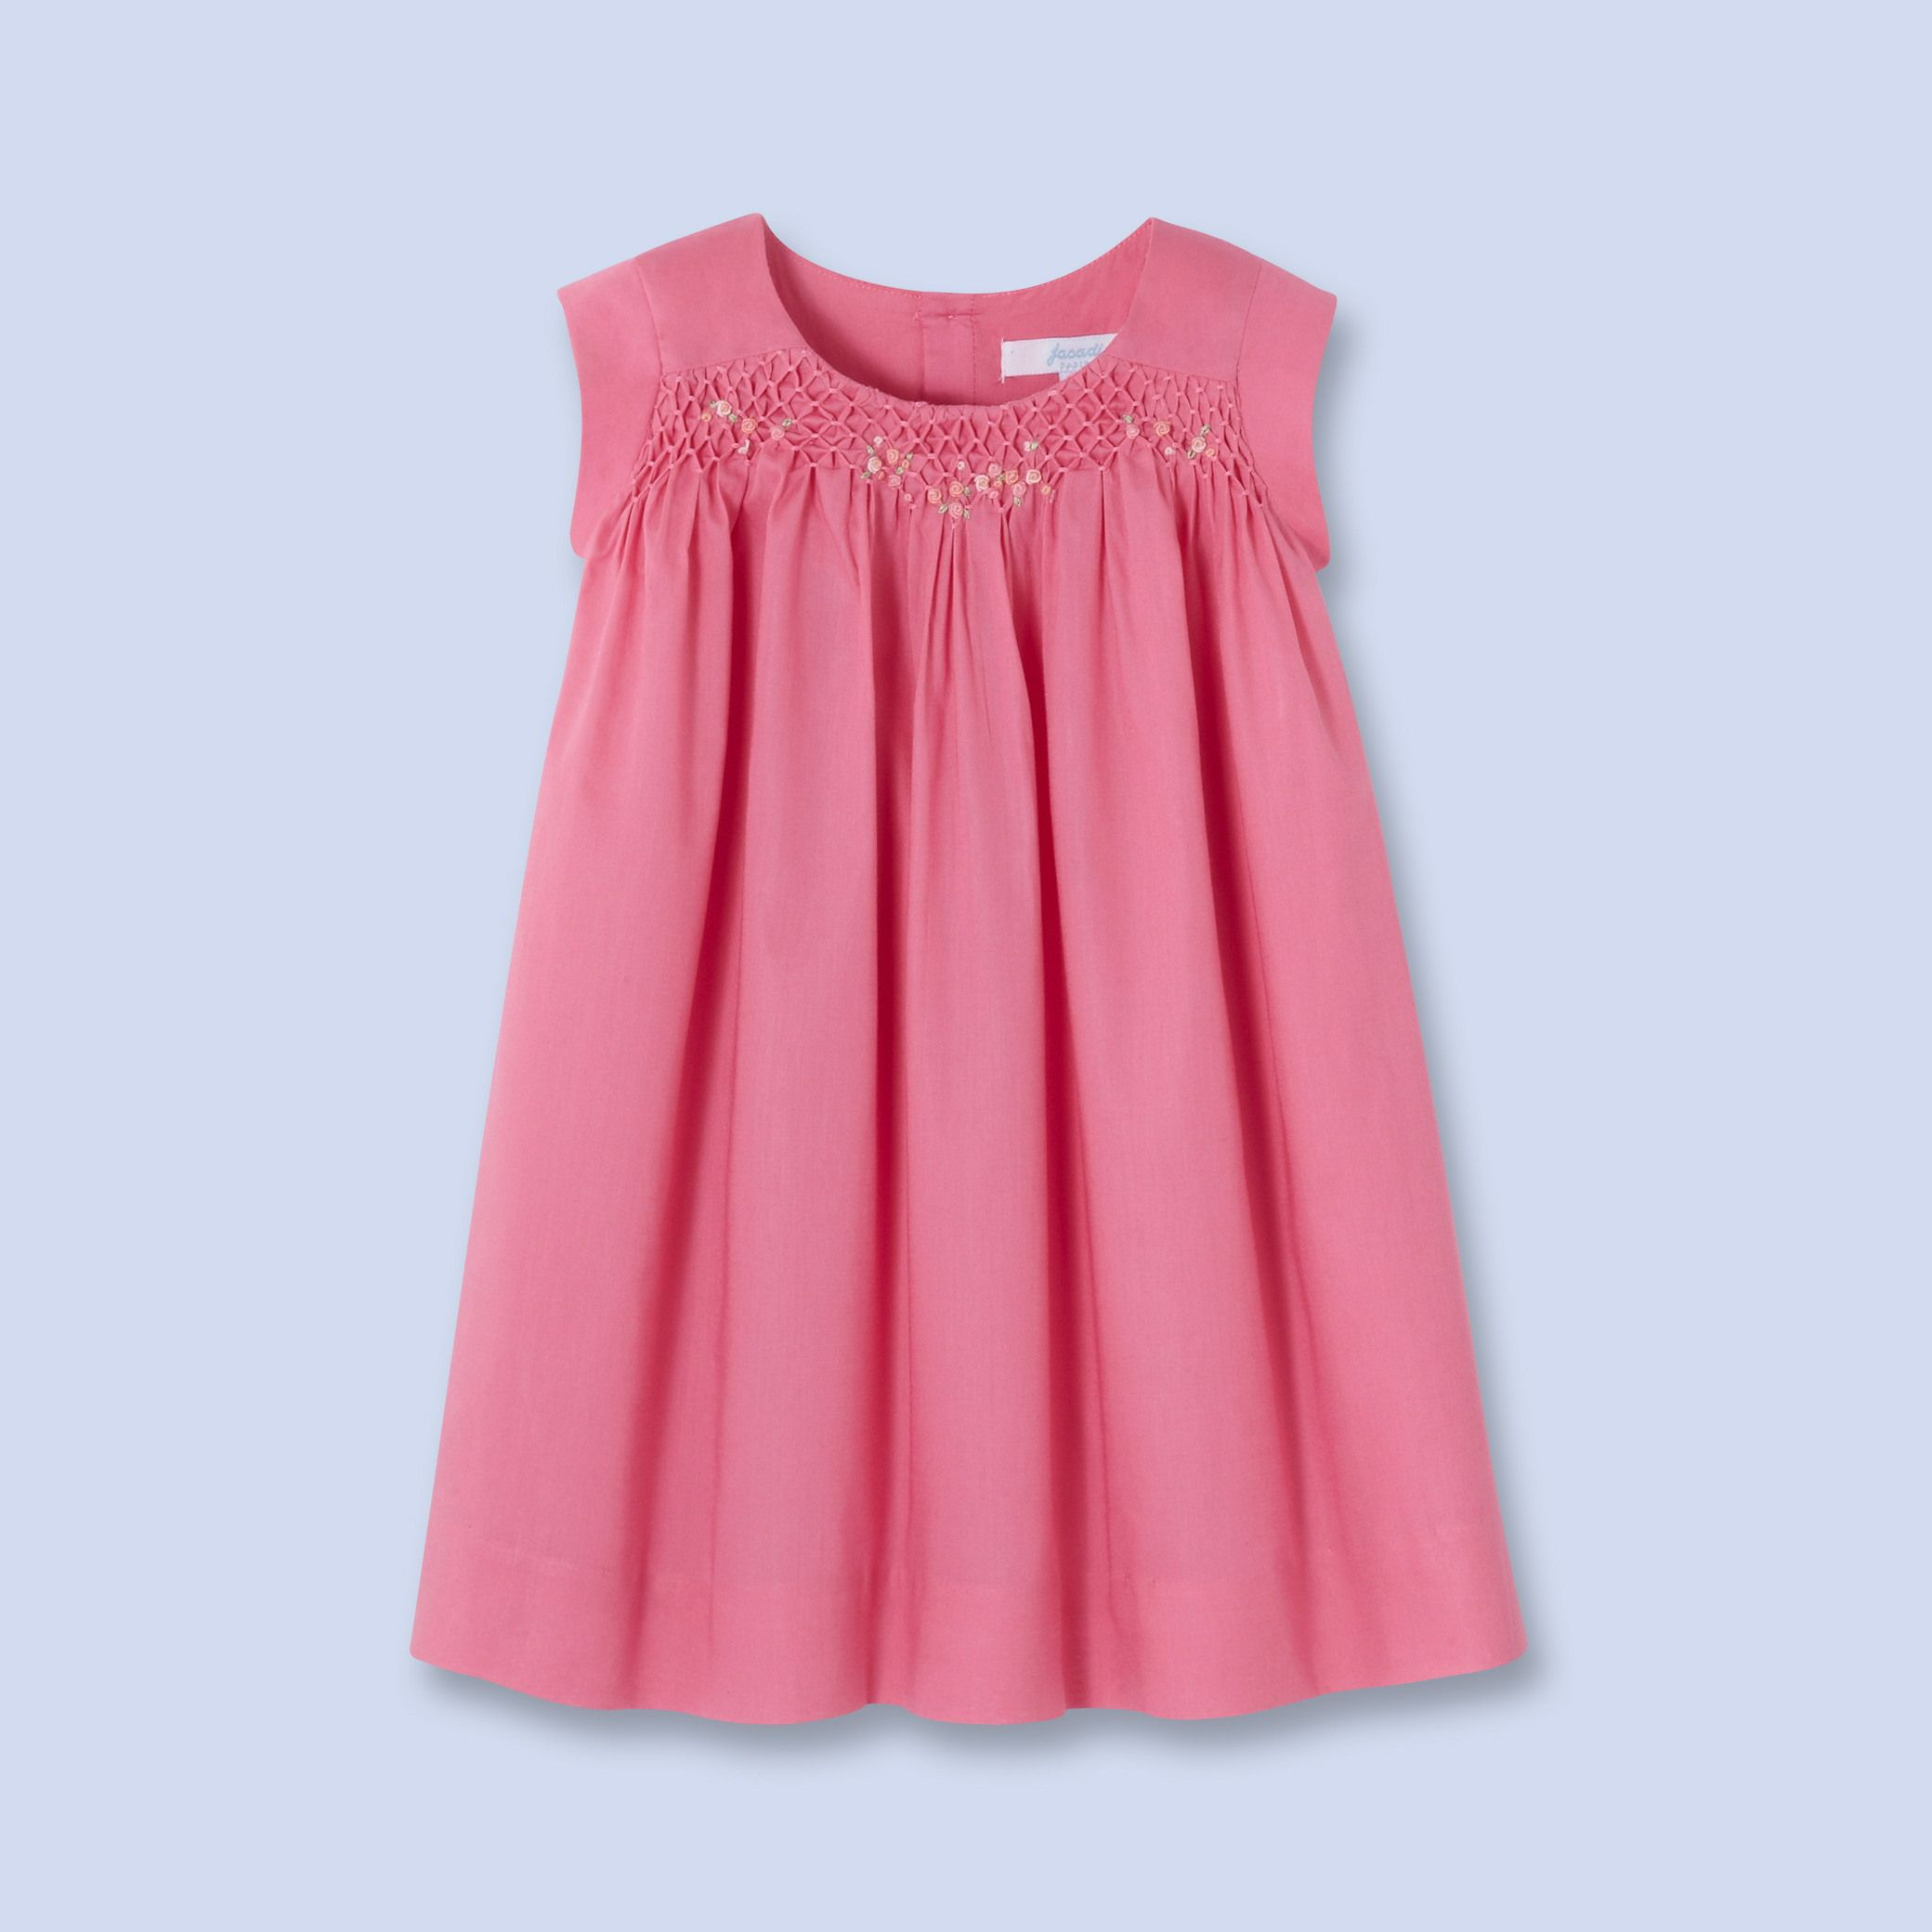 cfbf7b85af4b Hand embroidered and honeycomb smocked dress | Girls dresses | Pink ...